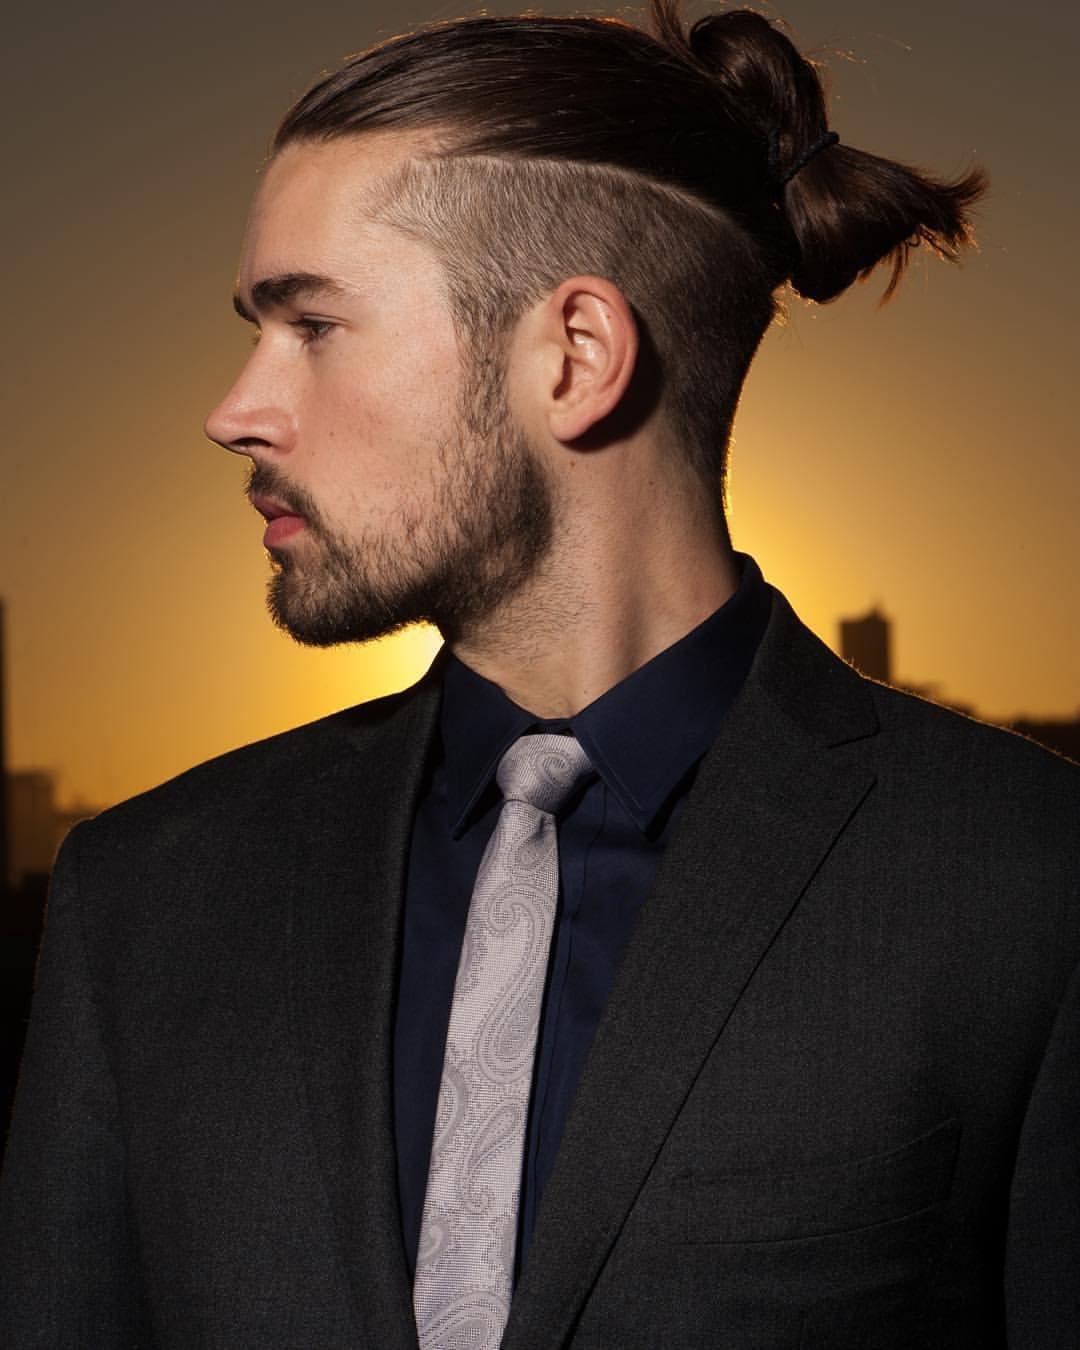 Мужские прически стрижка мужская модная